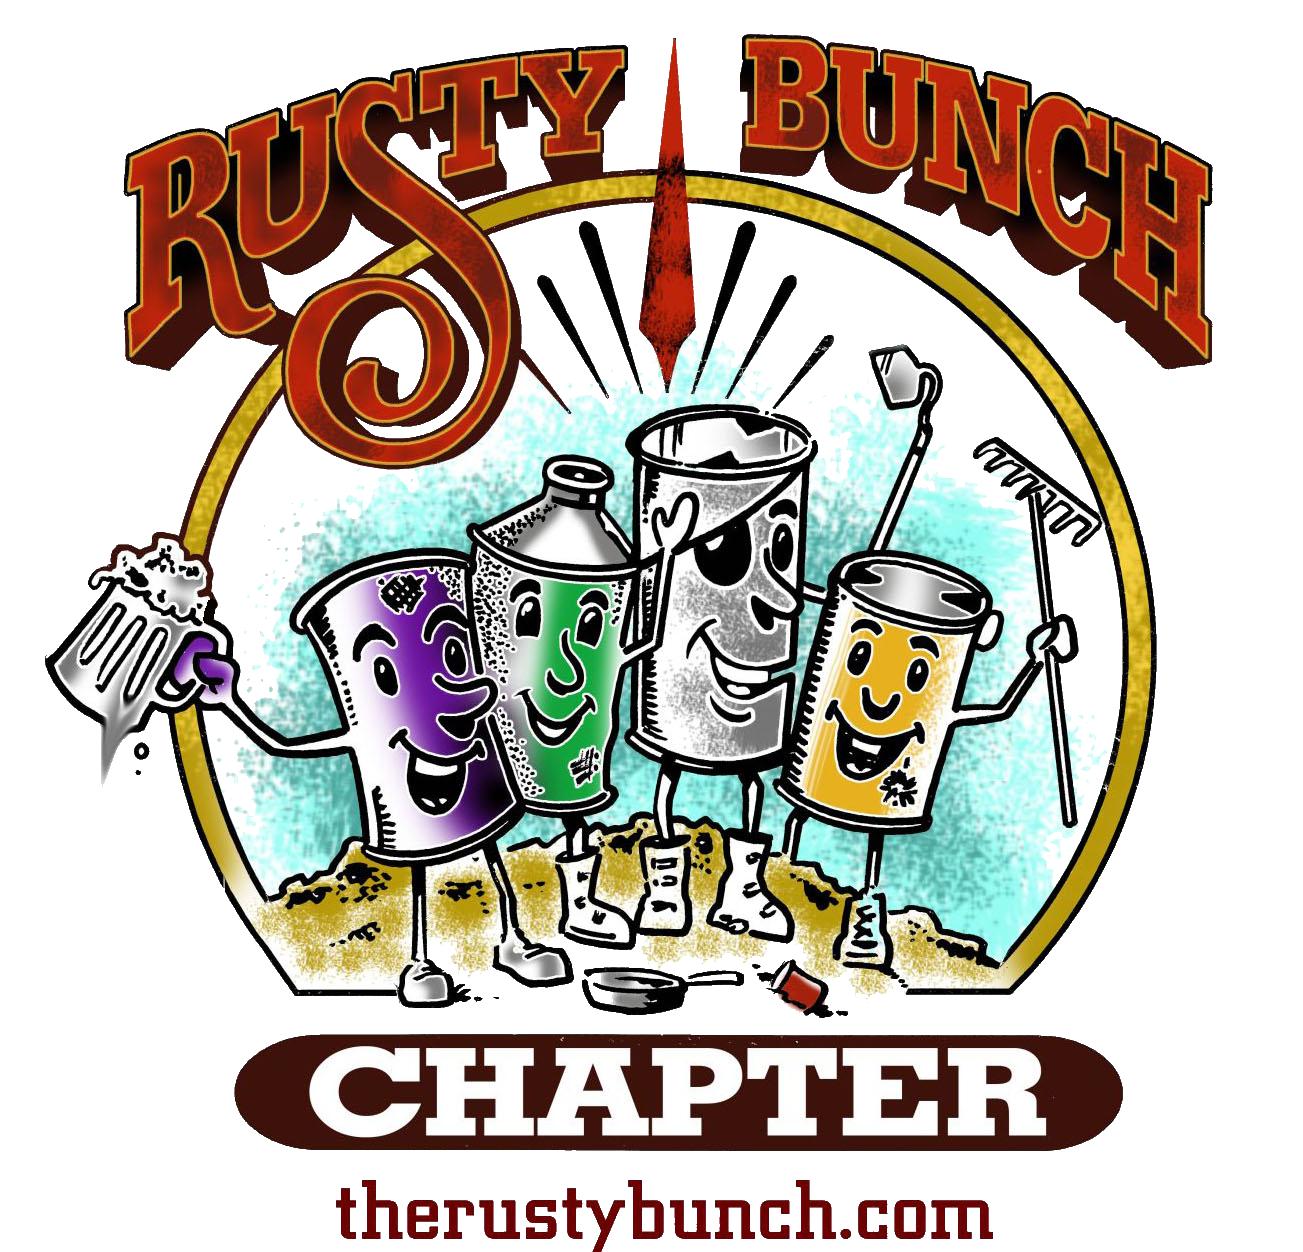 The Rusty Bunch